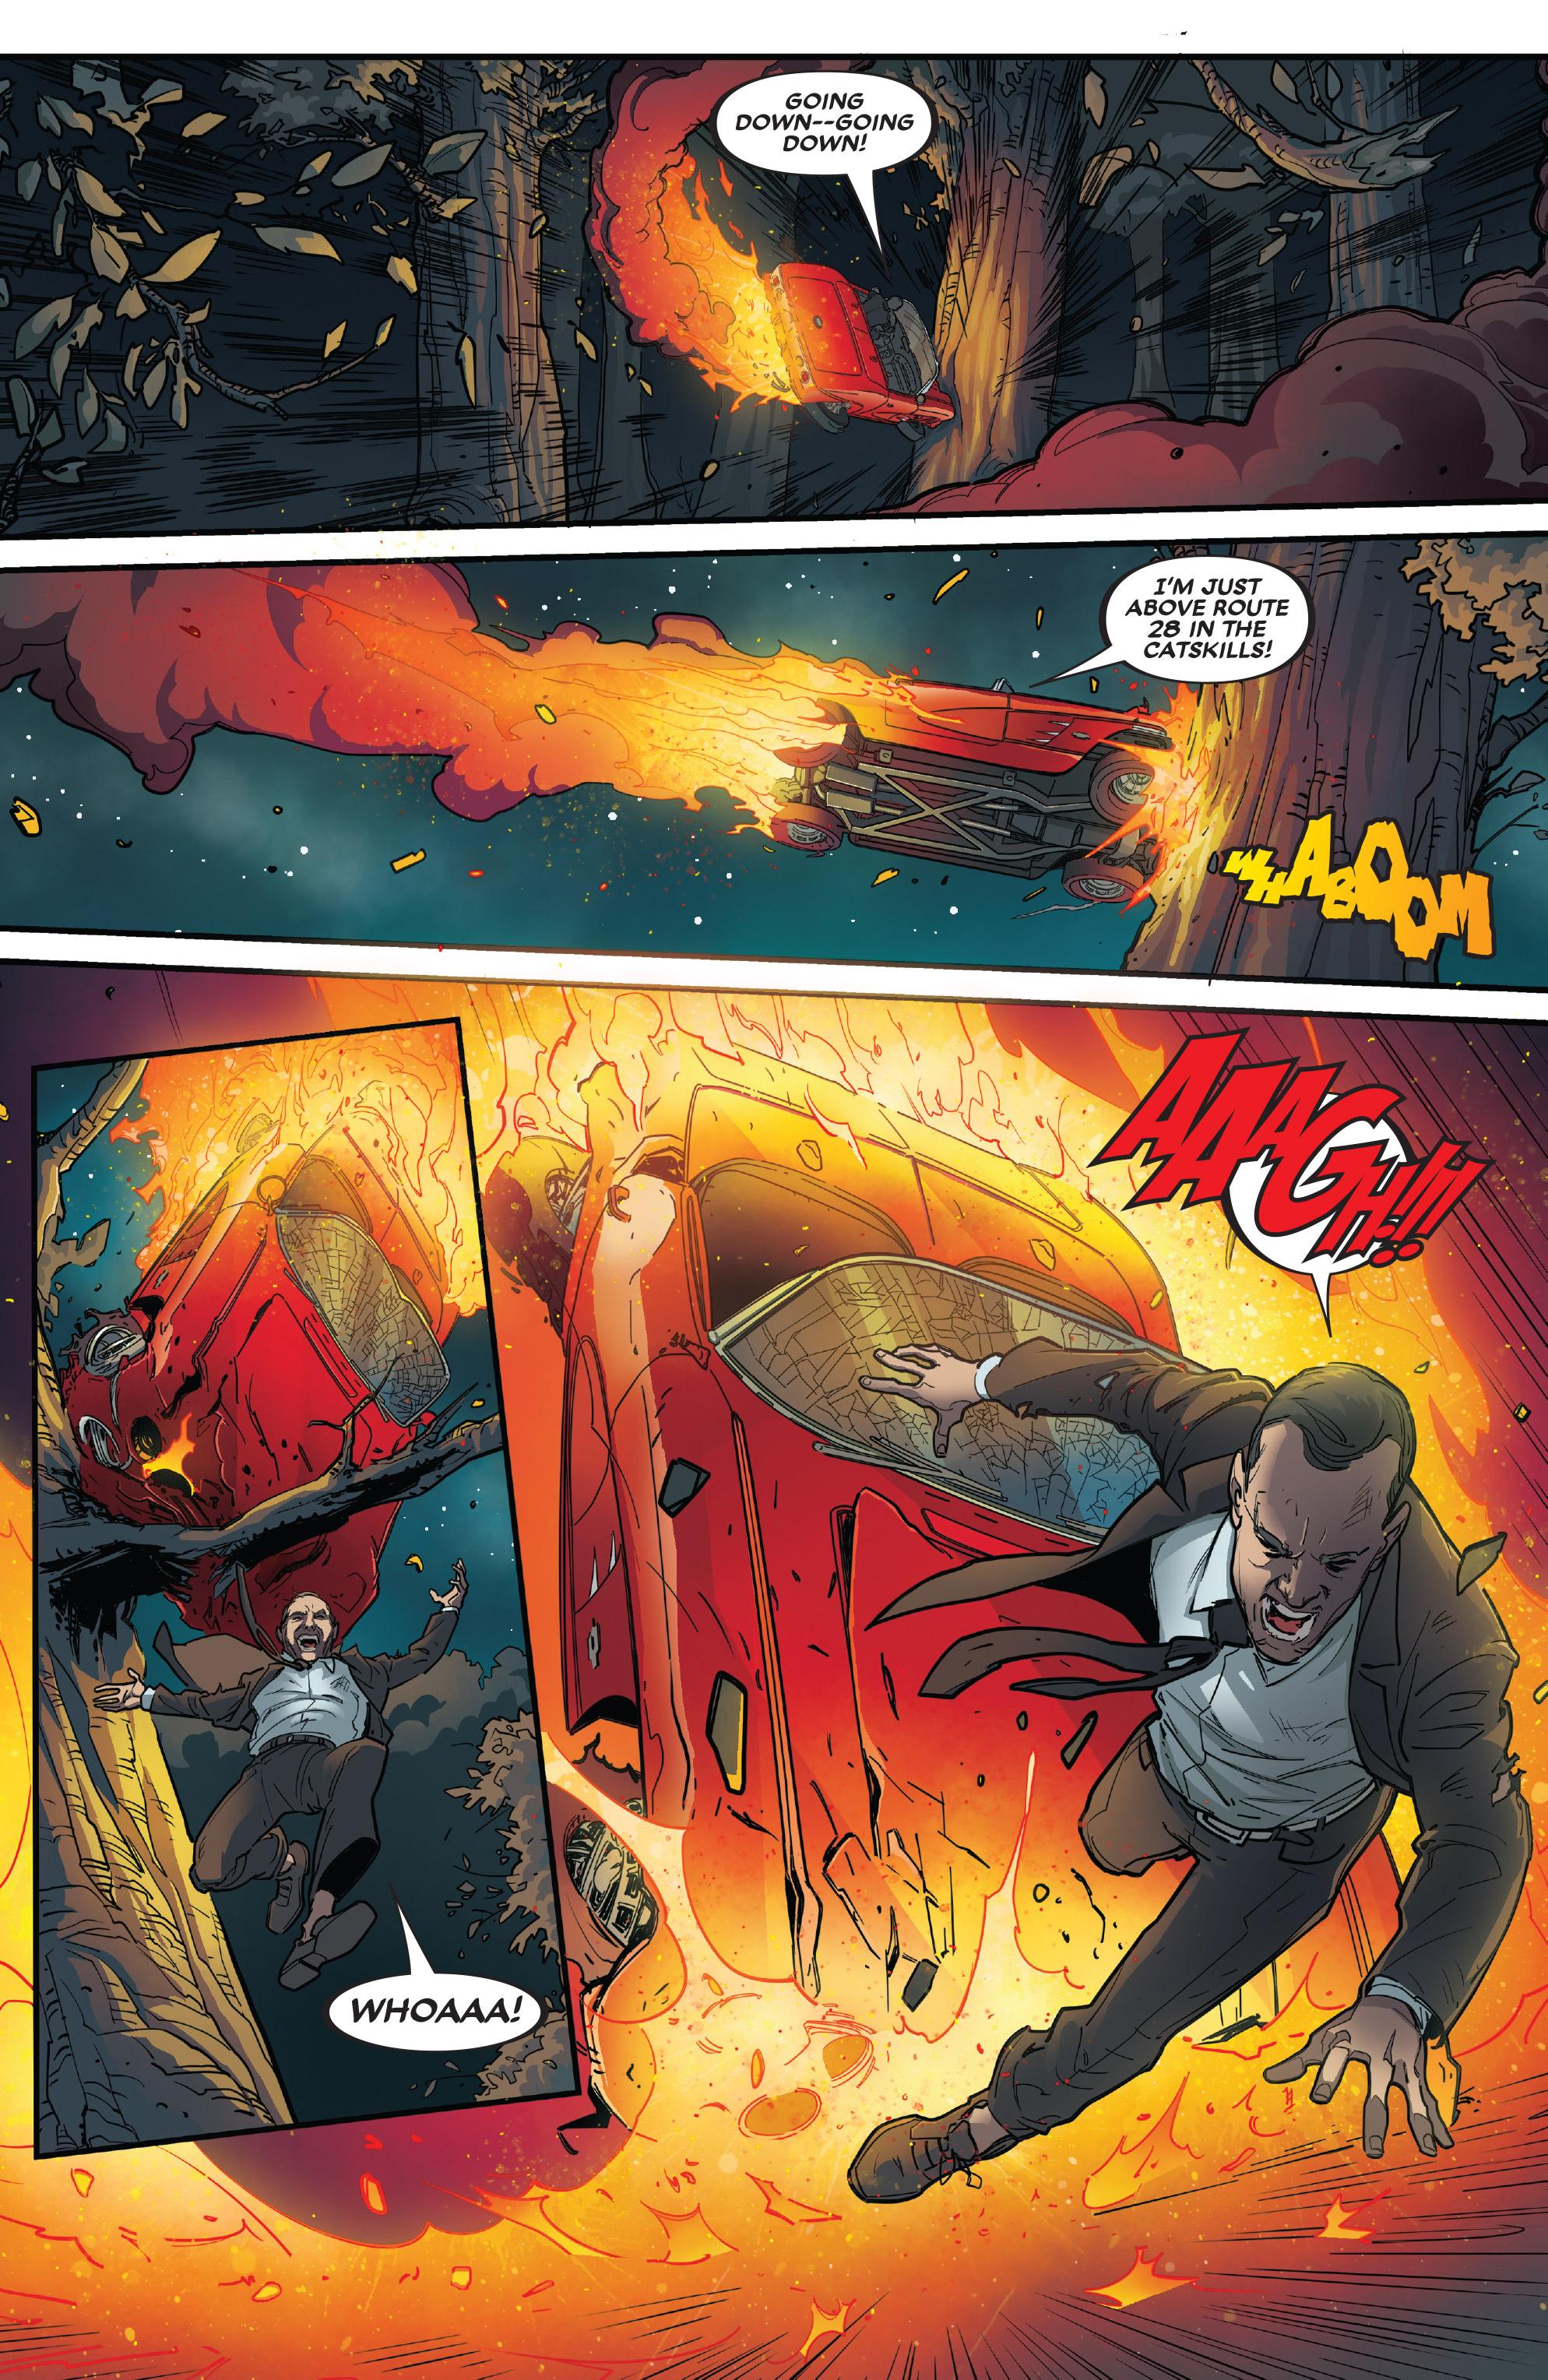 Read online Deadpool (2016) comic -  Issue #31 - 11